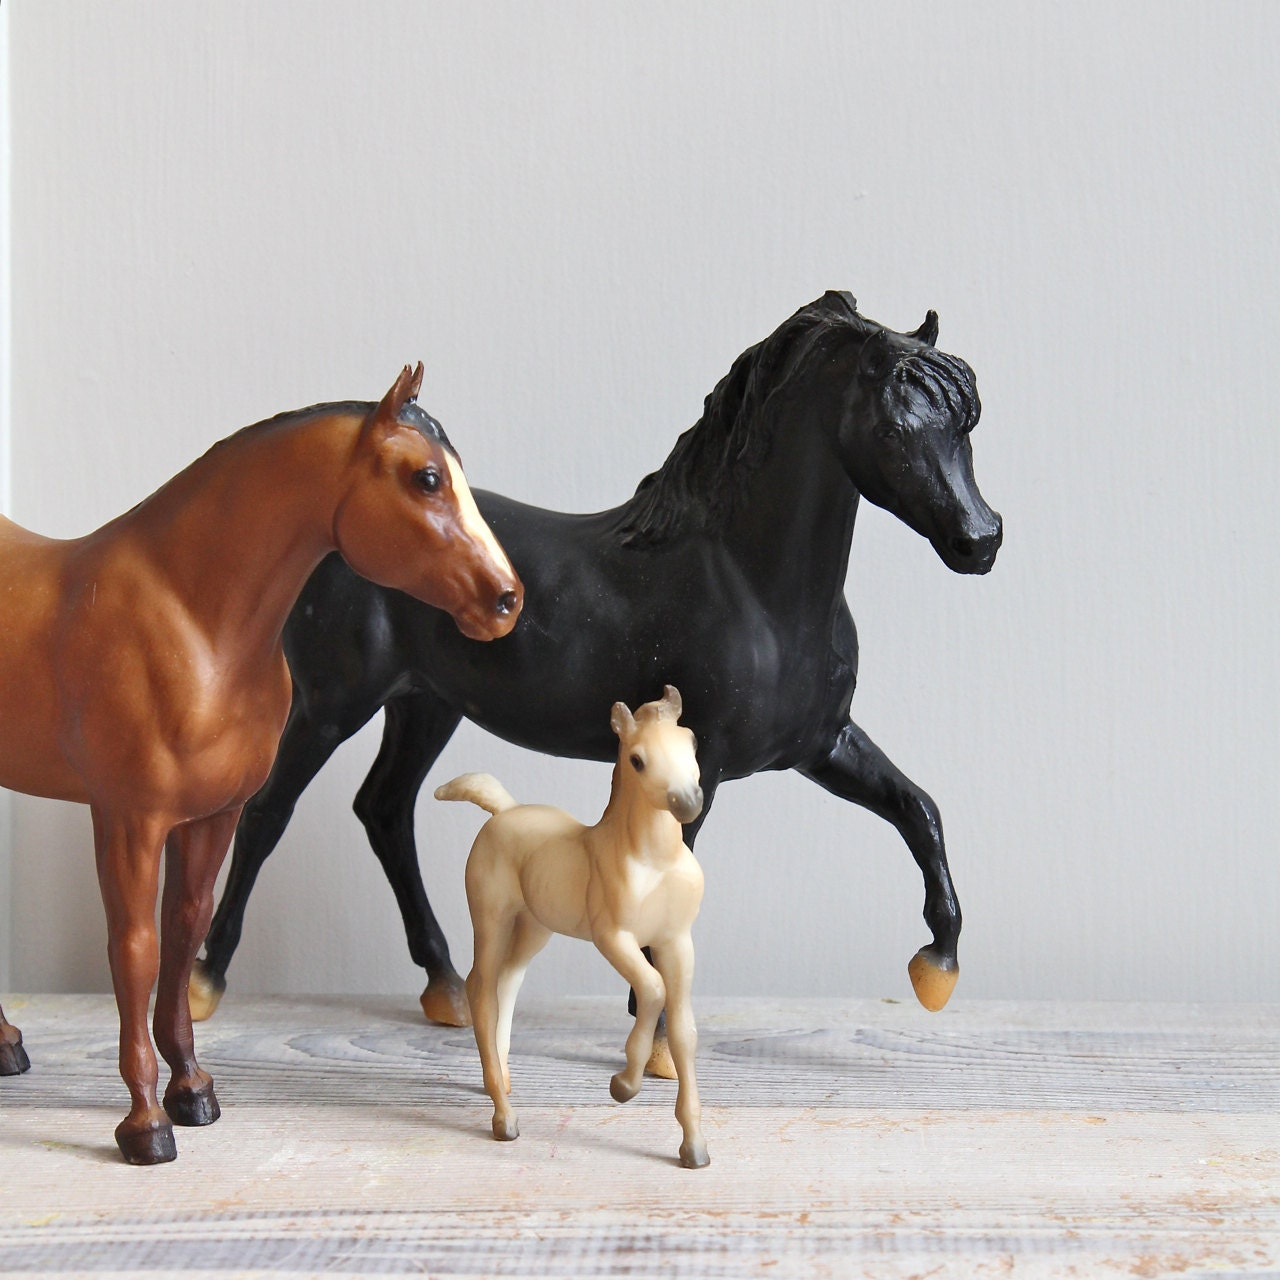 Breyer Horses Names Breyer Horse Video Name